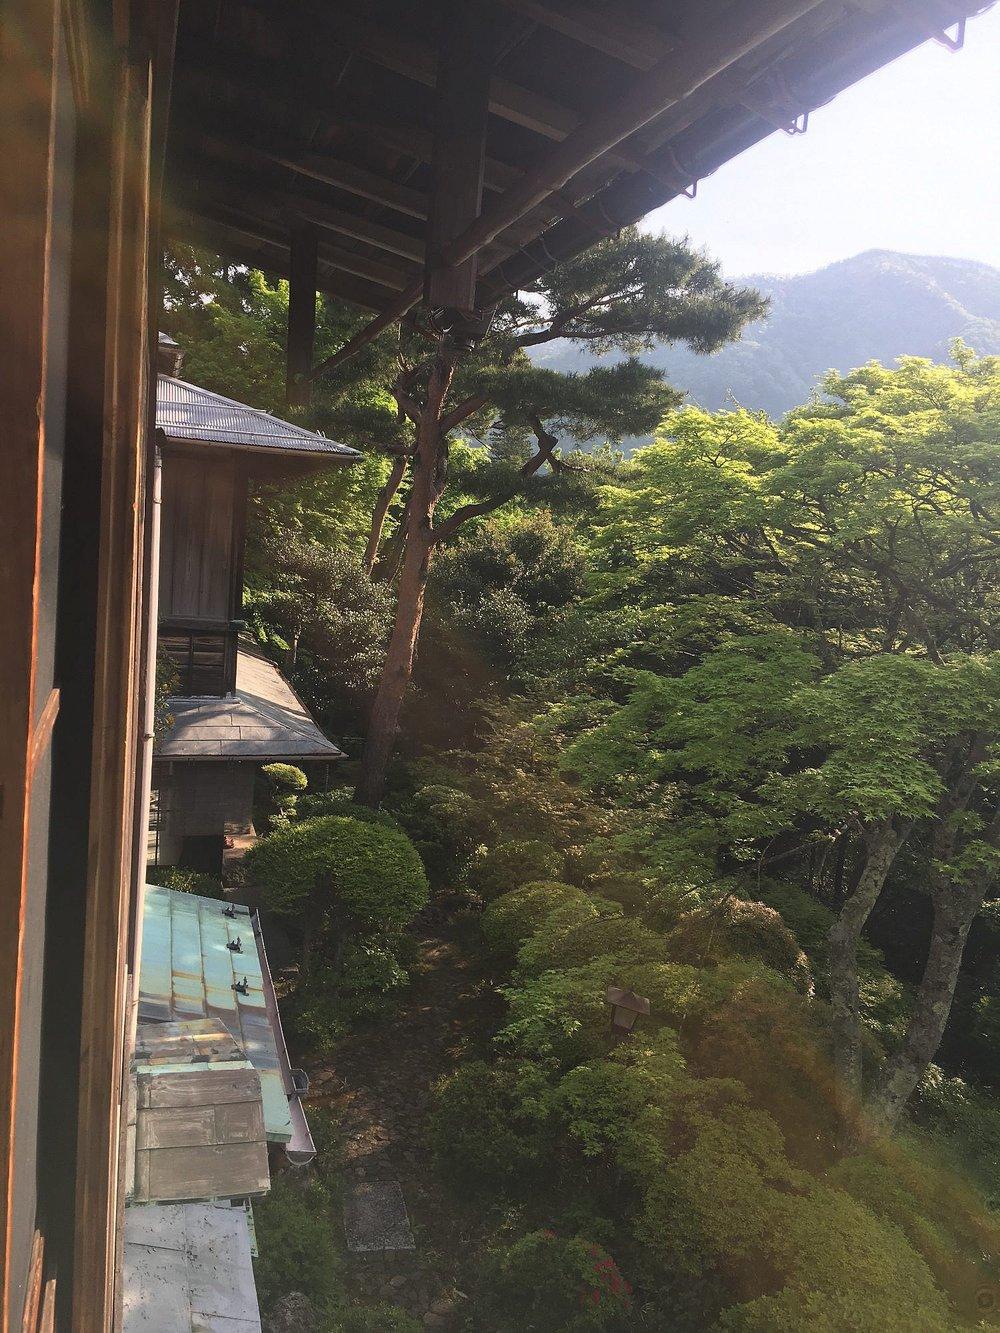 View from my Ryokan window in Gora, Hakone.